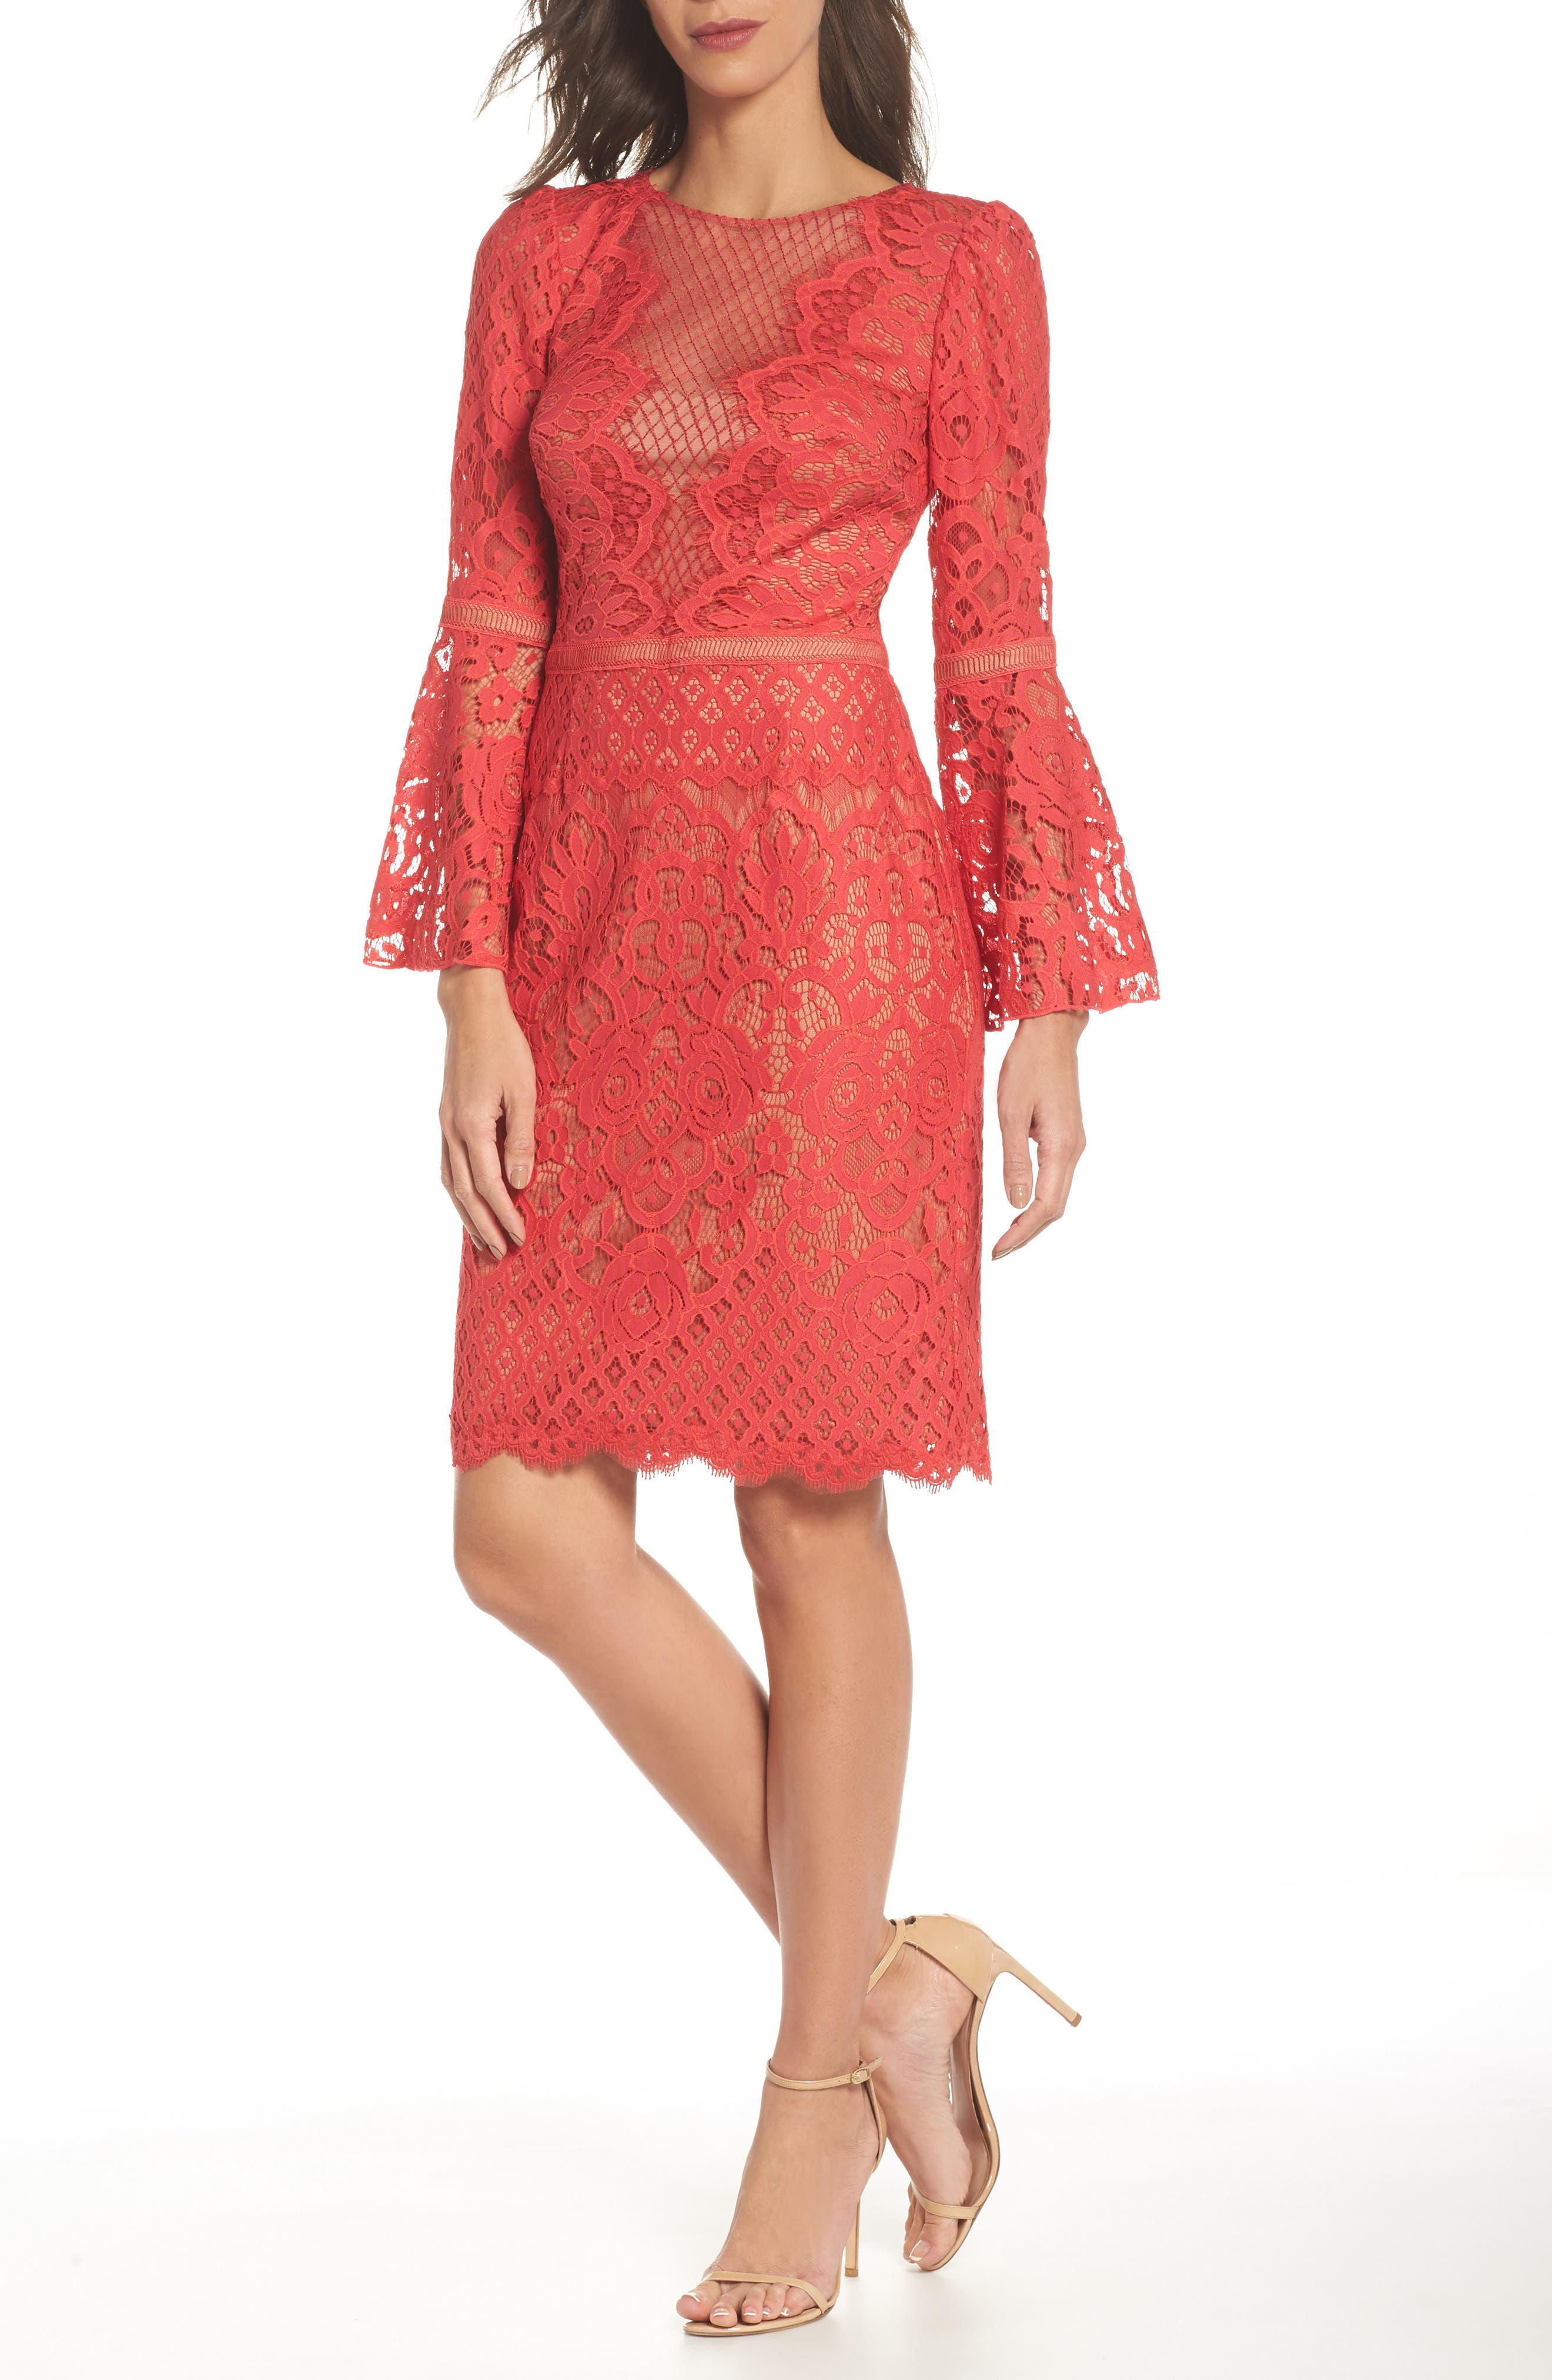 Main Image - Tadashi Shoji Kyra Bell Sleeve Lace Dress